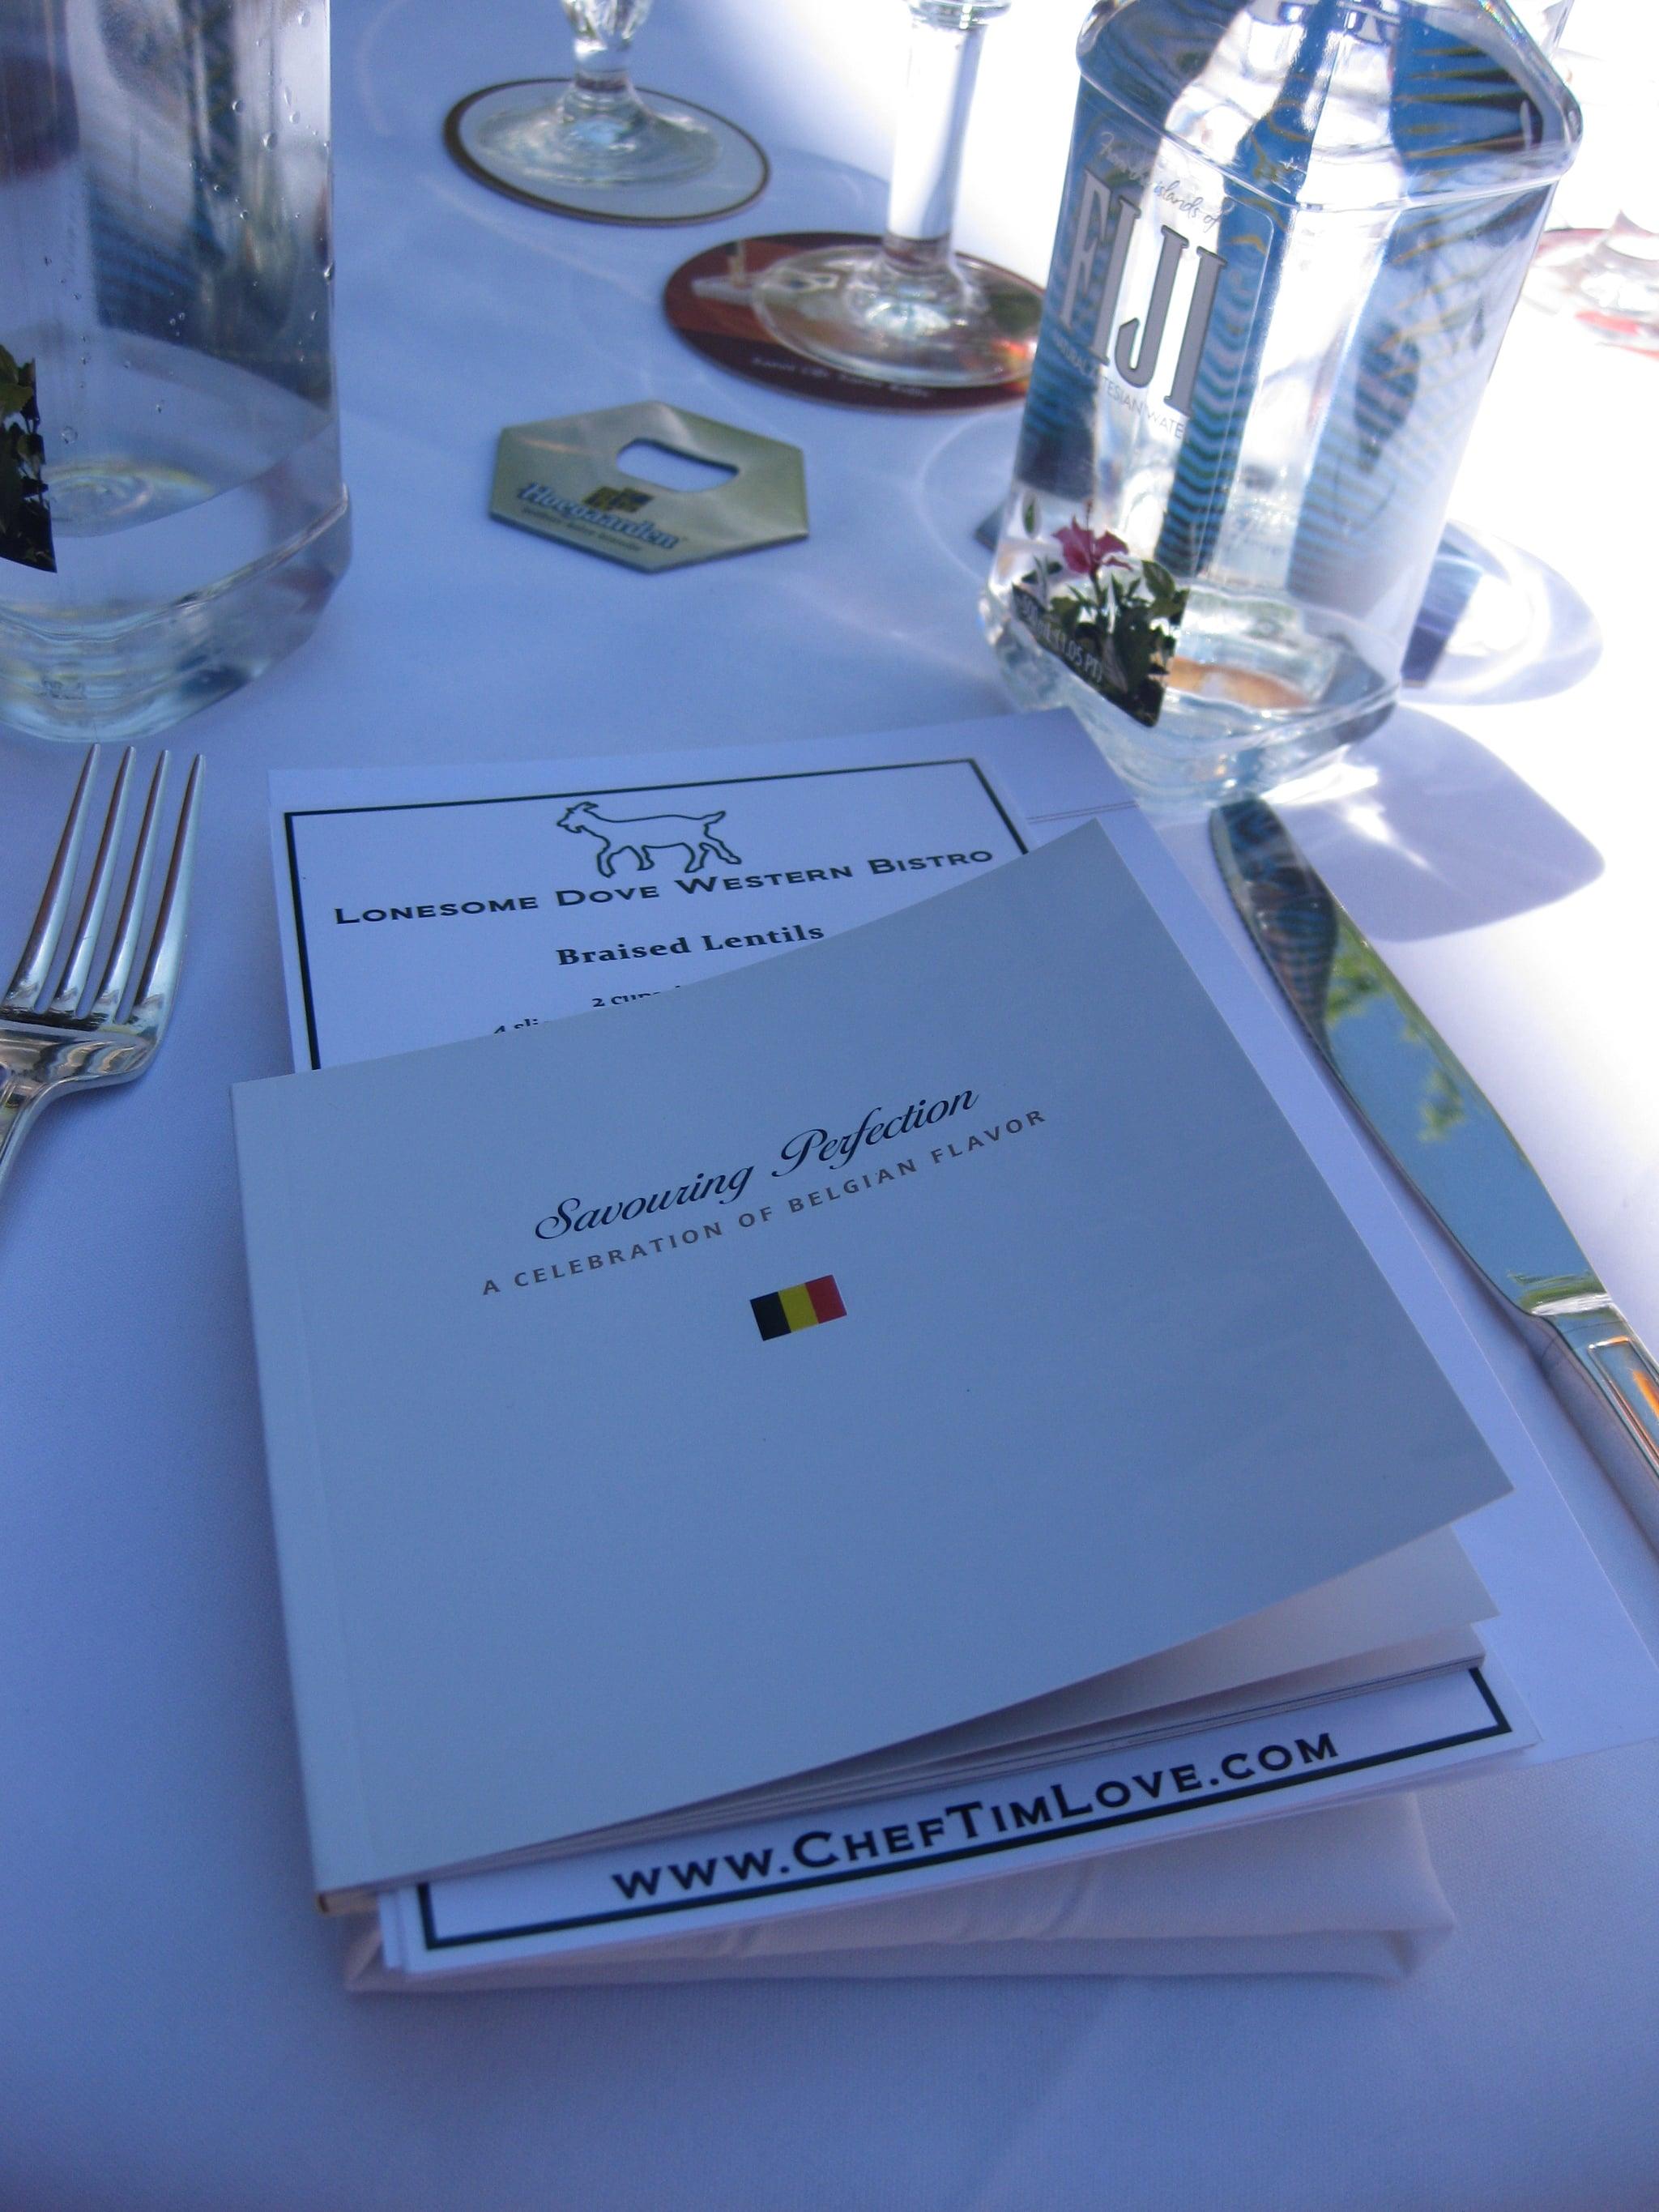 The menu and a recipe booklet.